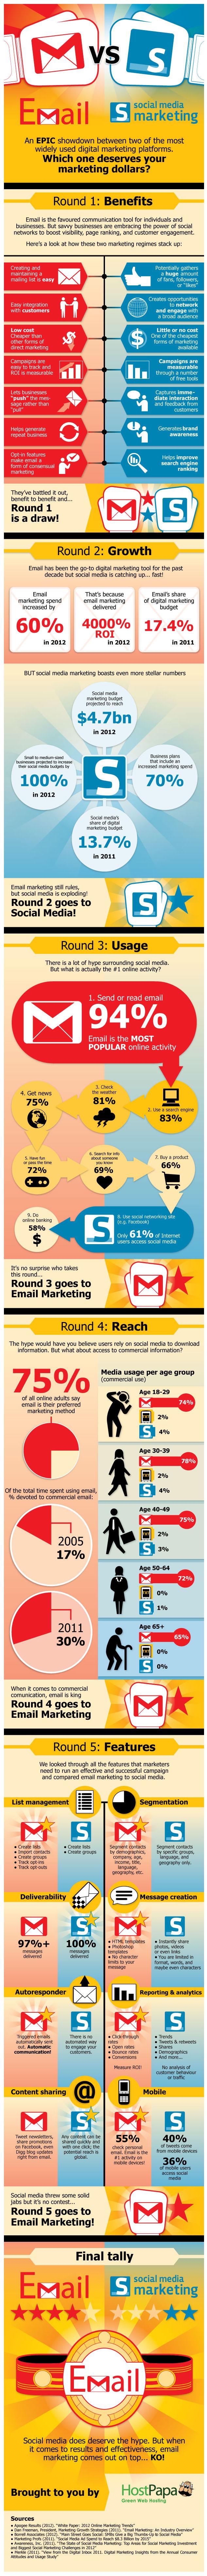 email-vs-social-media-marketing